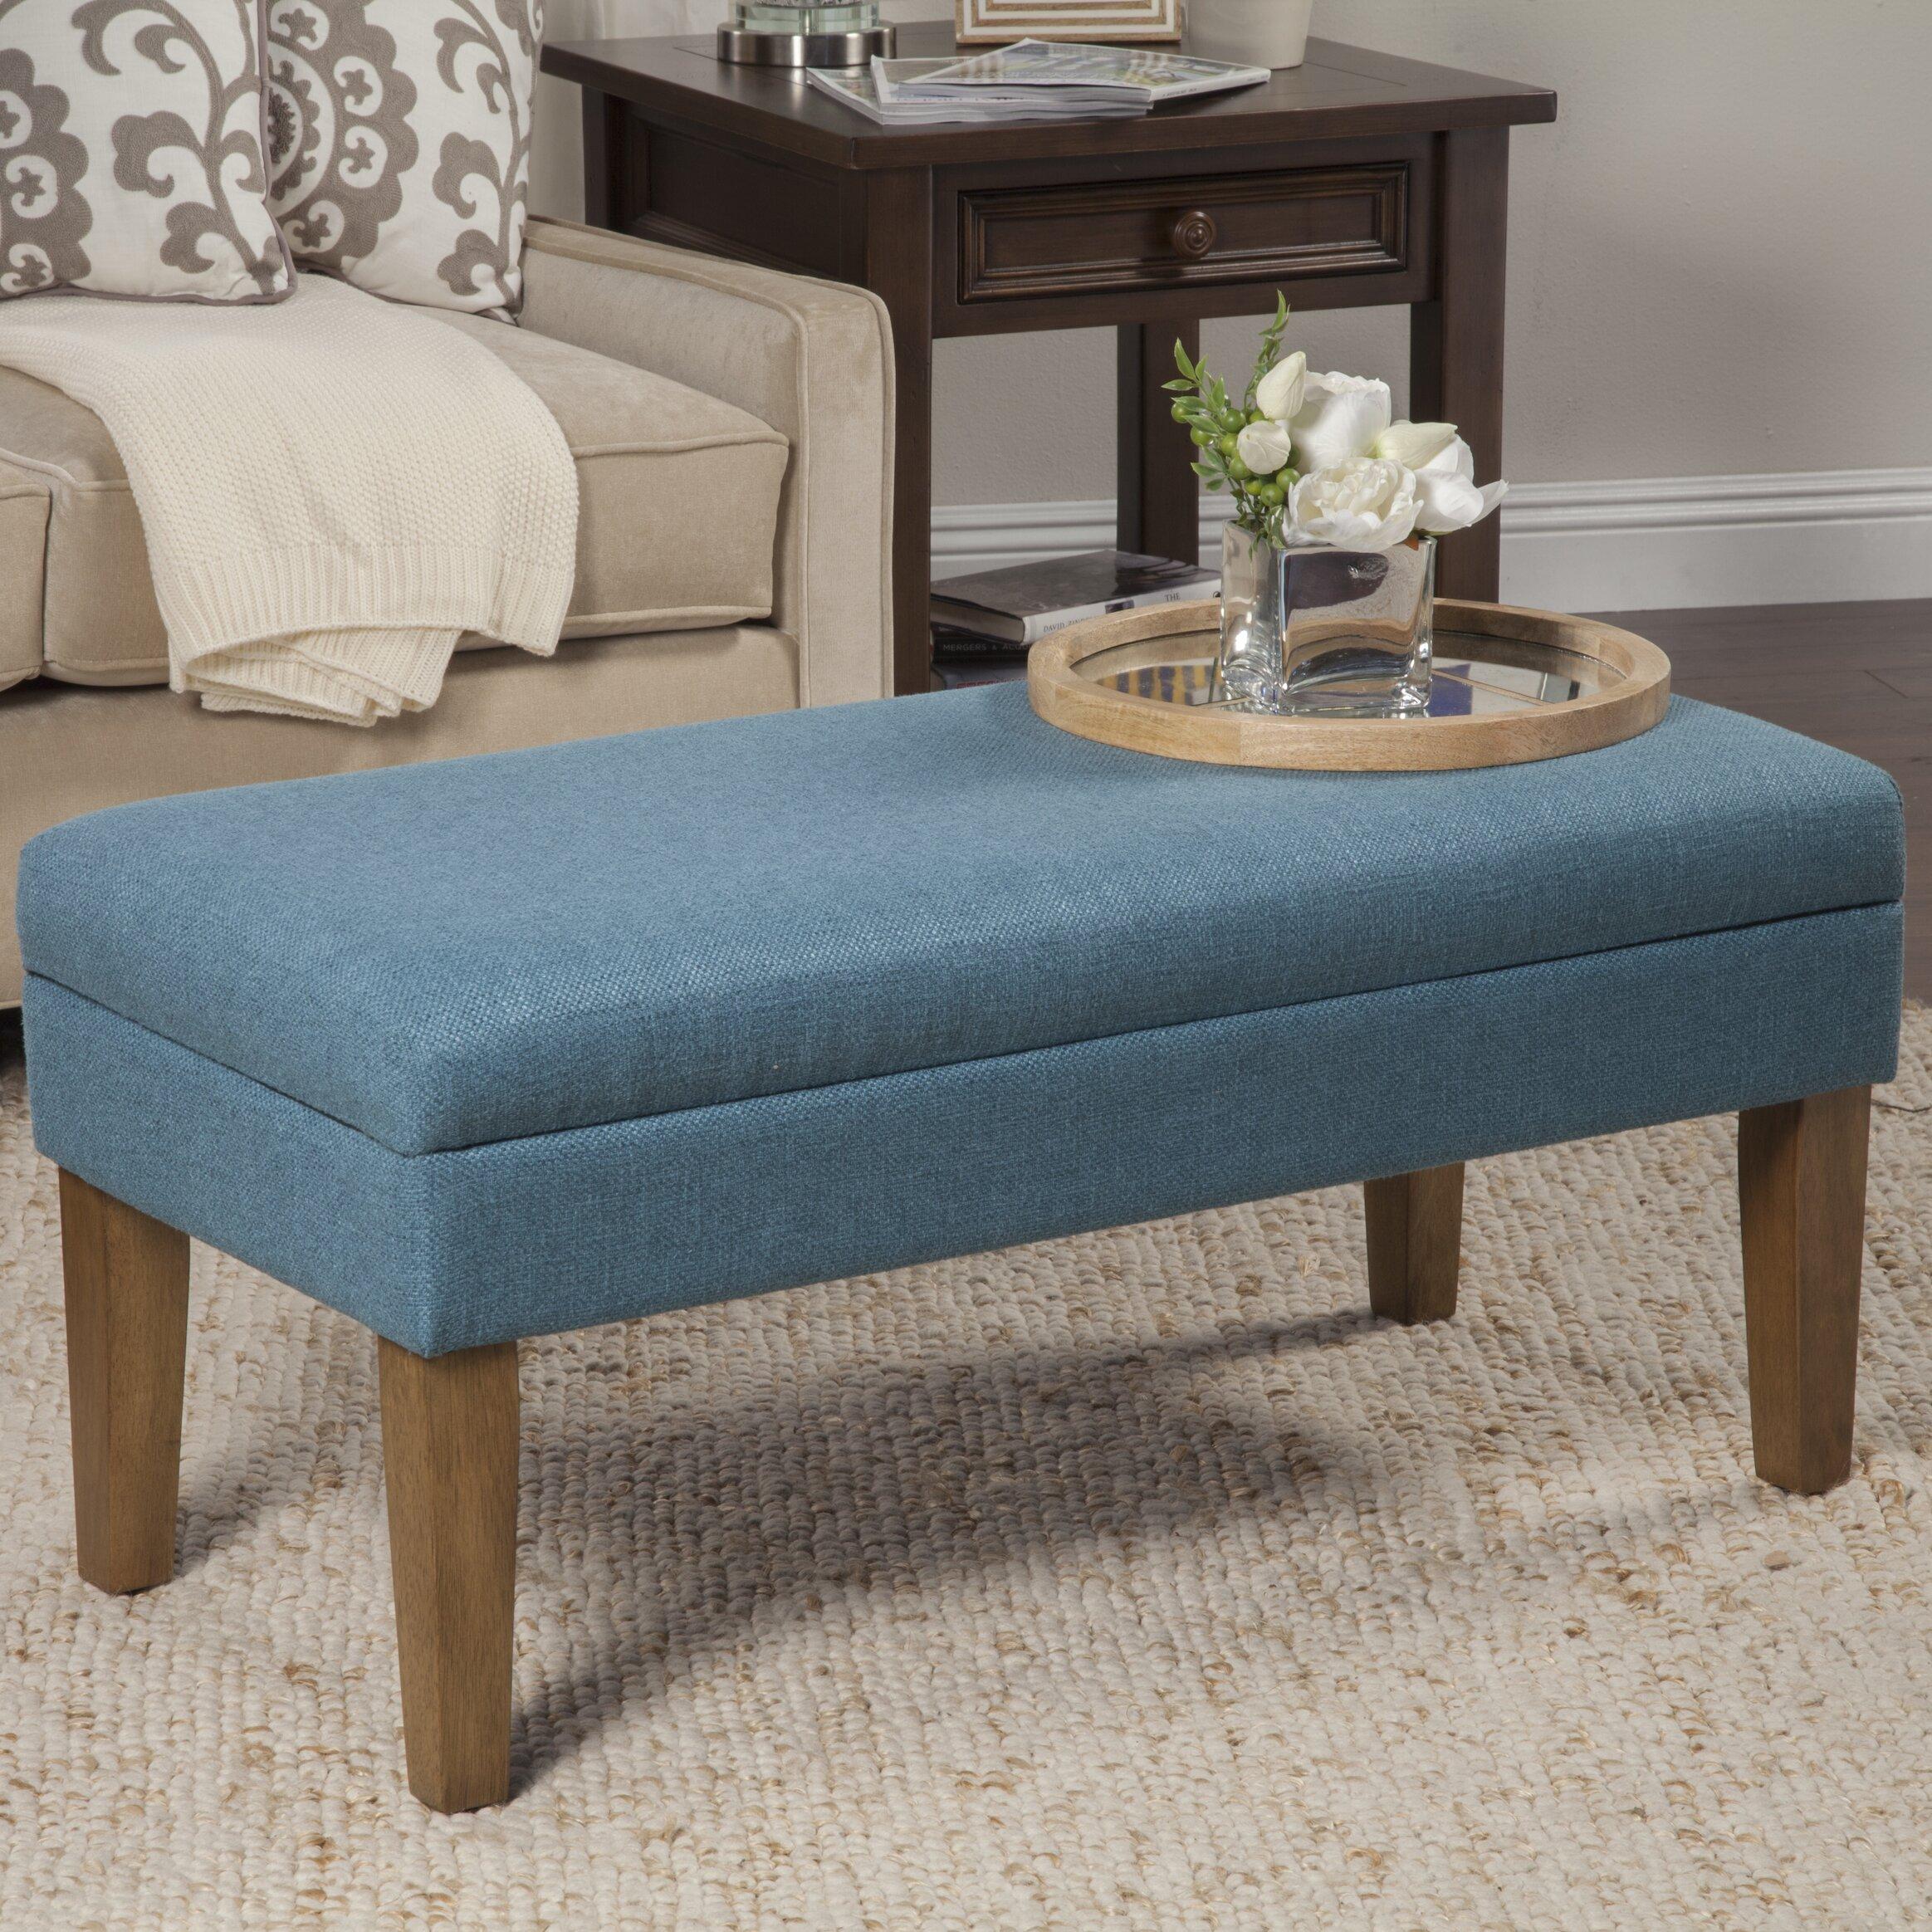 Axtell Decorative Storage Bench Reviews Allmodern